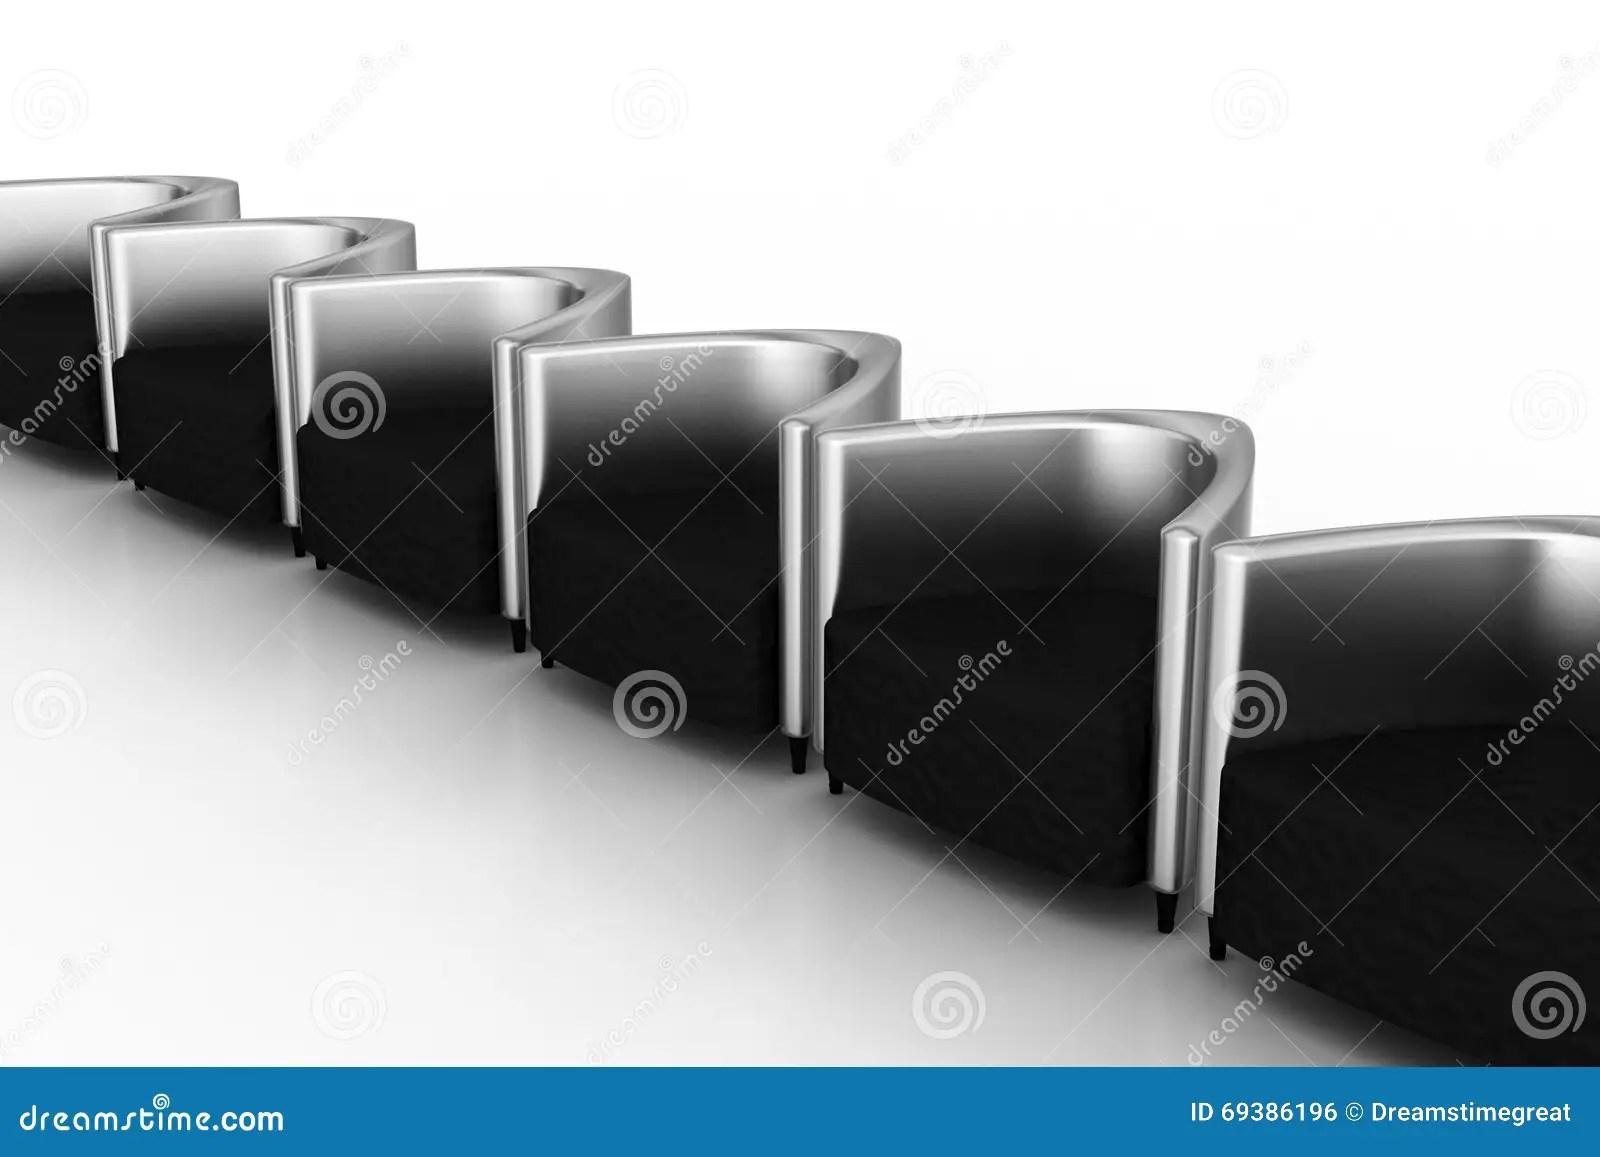 corner booth seating kitchen restaurant tables 3d角落的座位库存例证 插画包括有对象 椅子 唯一 接收 皮革 居住 3d角落的座位